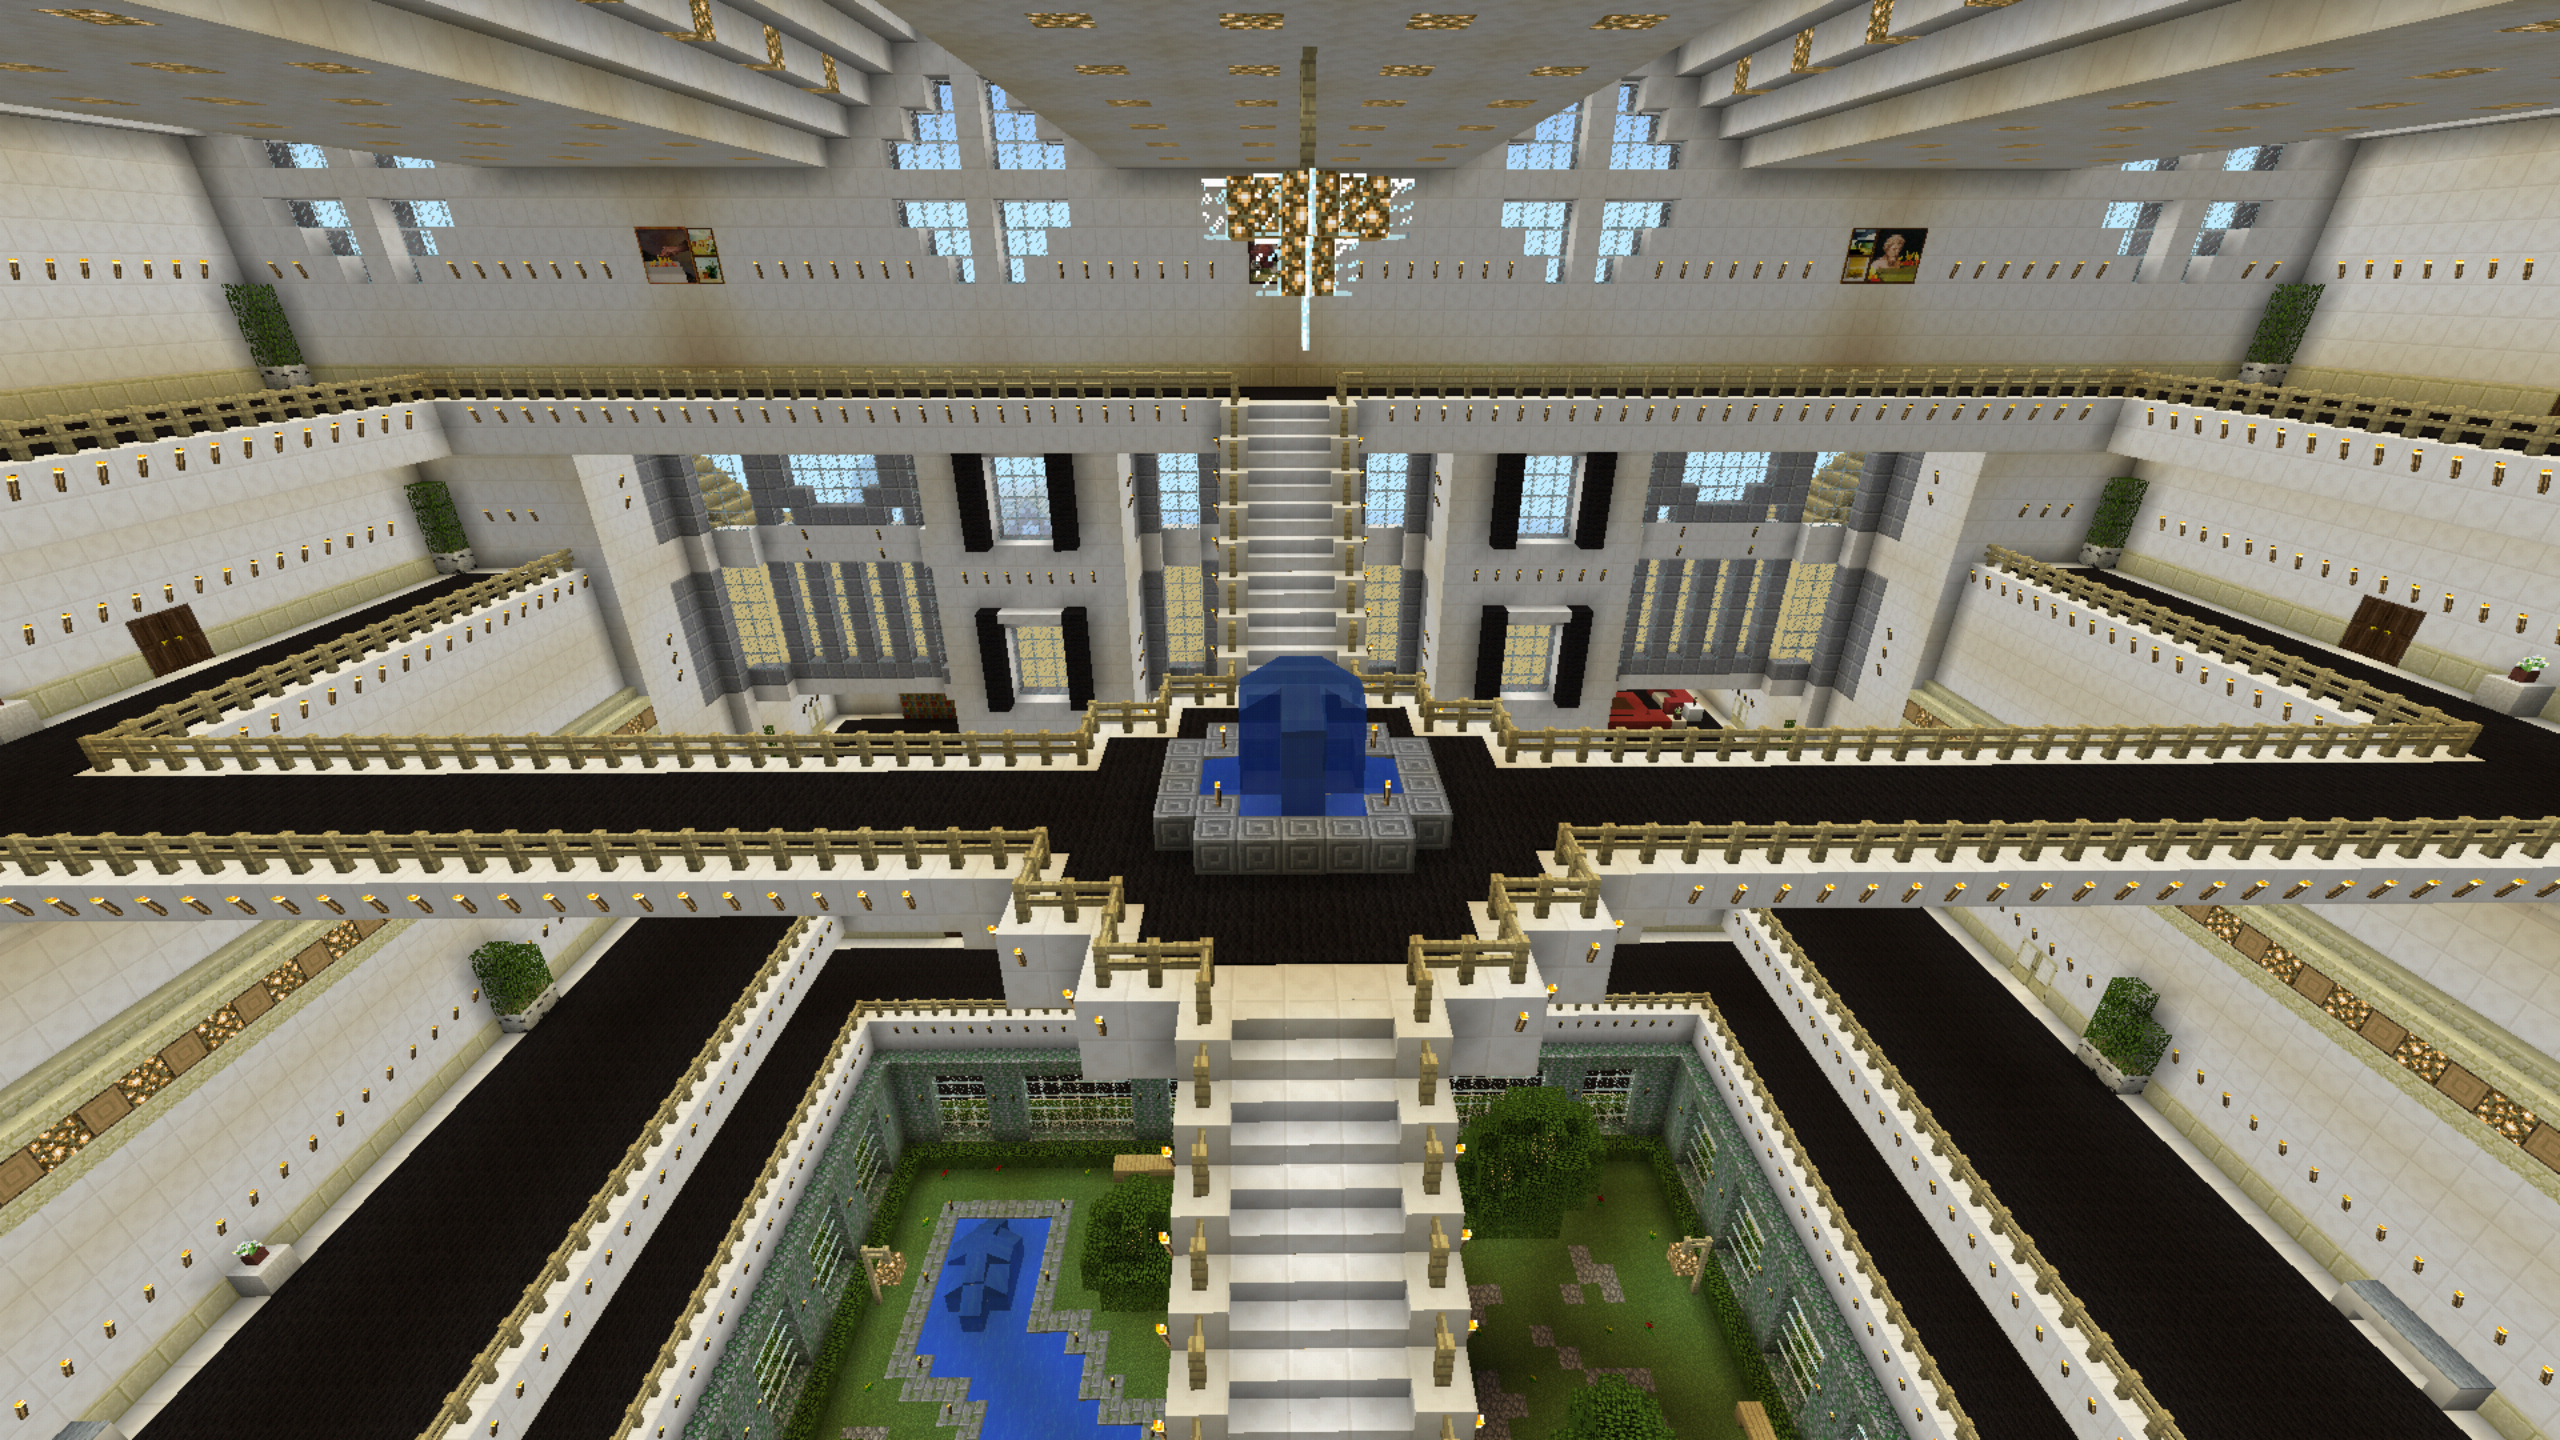 Minecraft House Interior Mansion Building Minecraft Houses